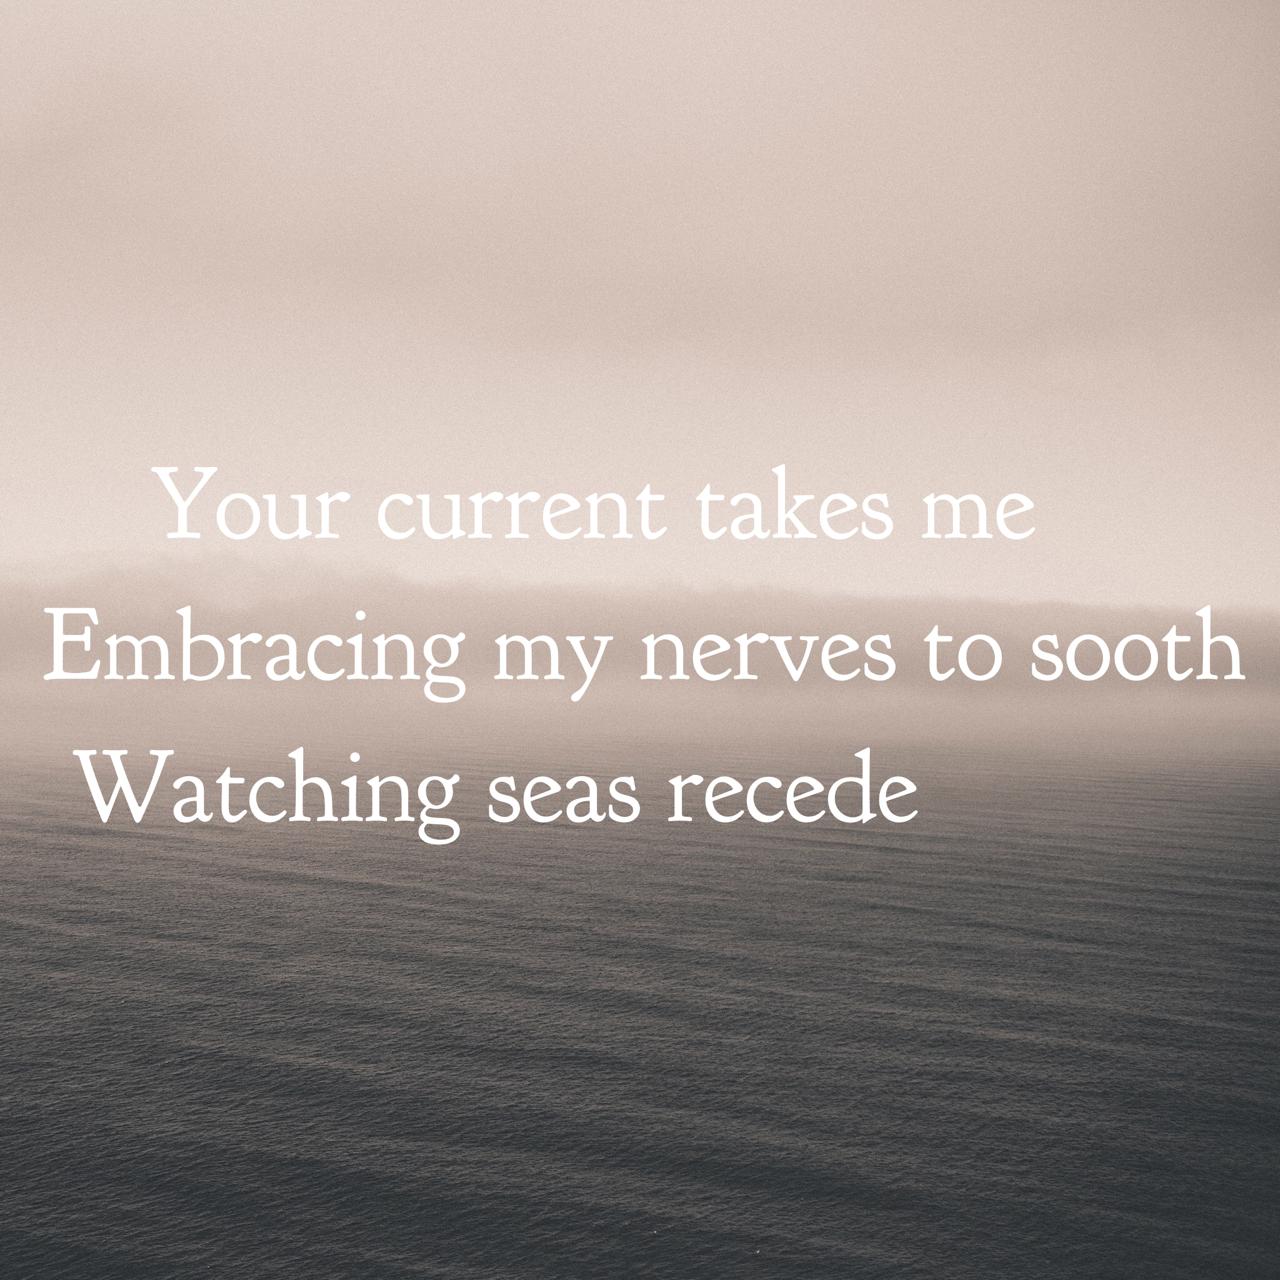 Haiku_Elizabeth_Lorayne_Ocean_Lure.png